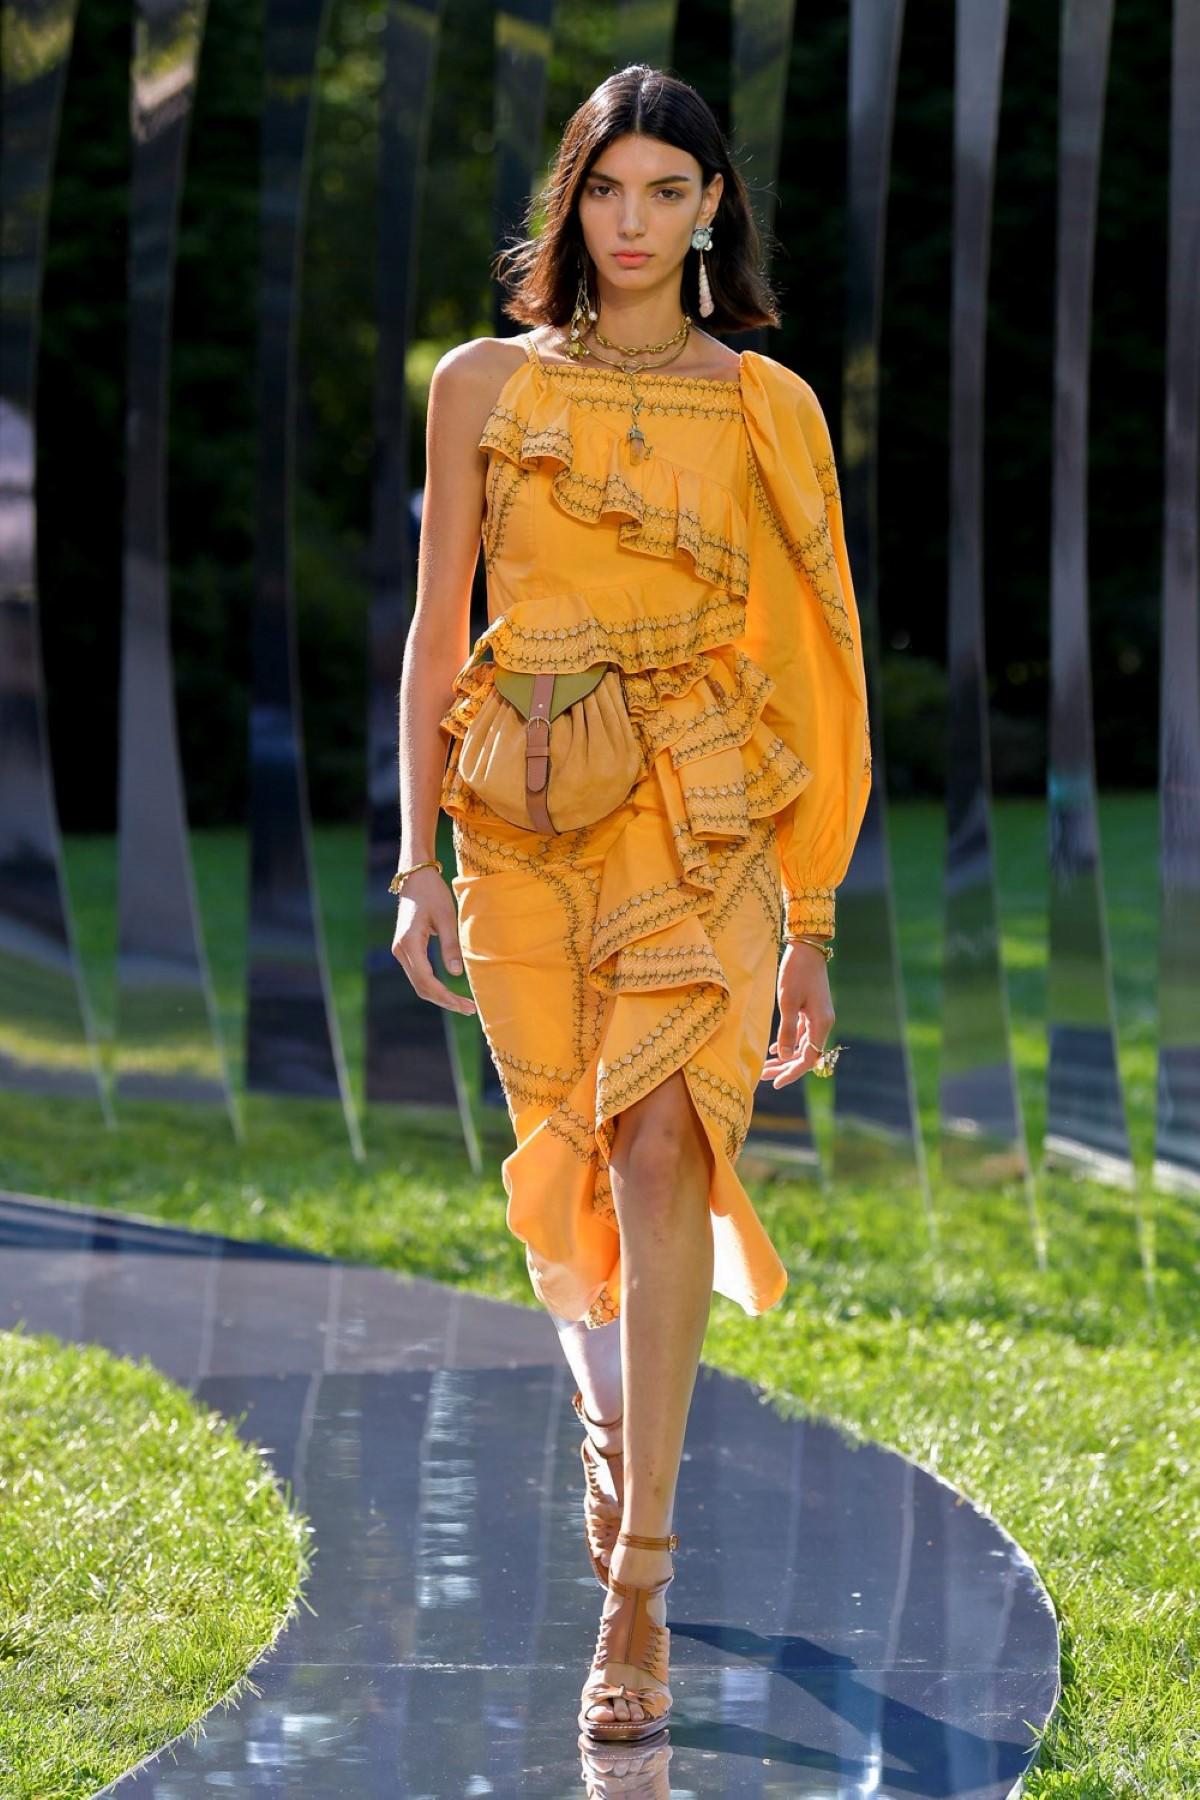 Ulla Johnson Spring Summer 2022 - New York Fashion WeekUlla Johnson Spring Summer 2022 - New York Fashion Week